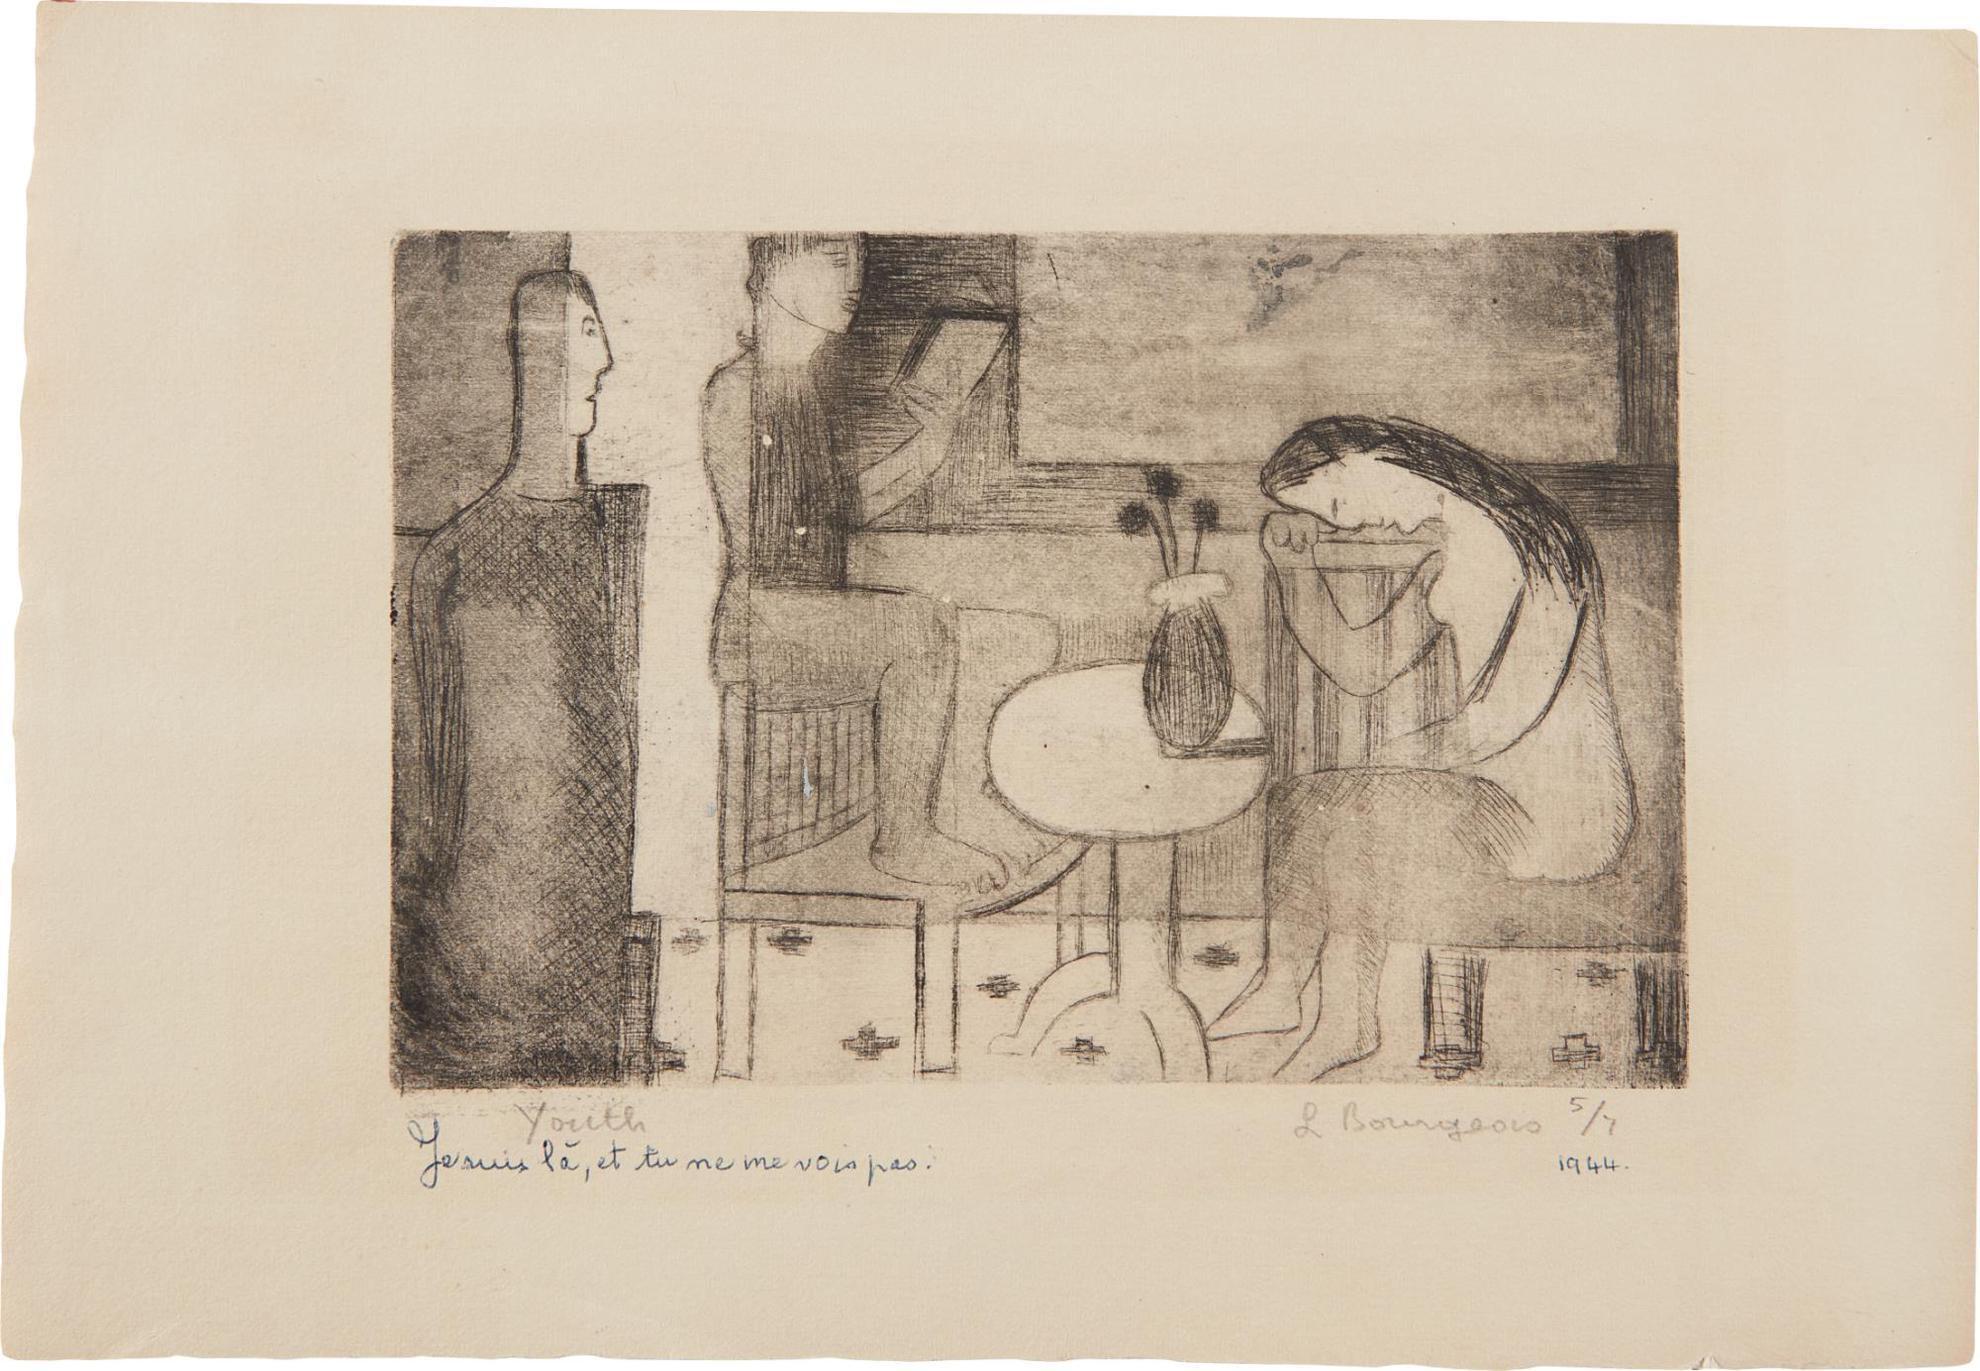 Louise Bourgeois-Jeunesse (Youth)-1944